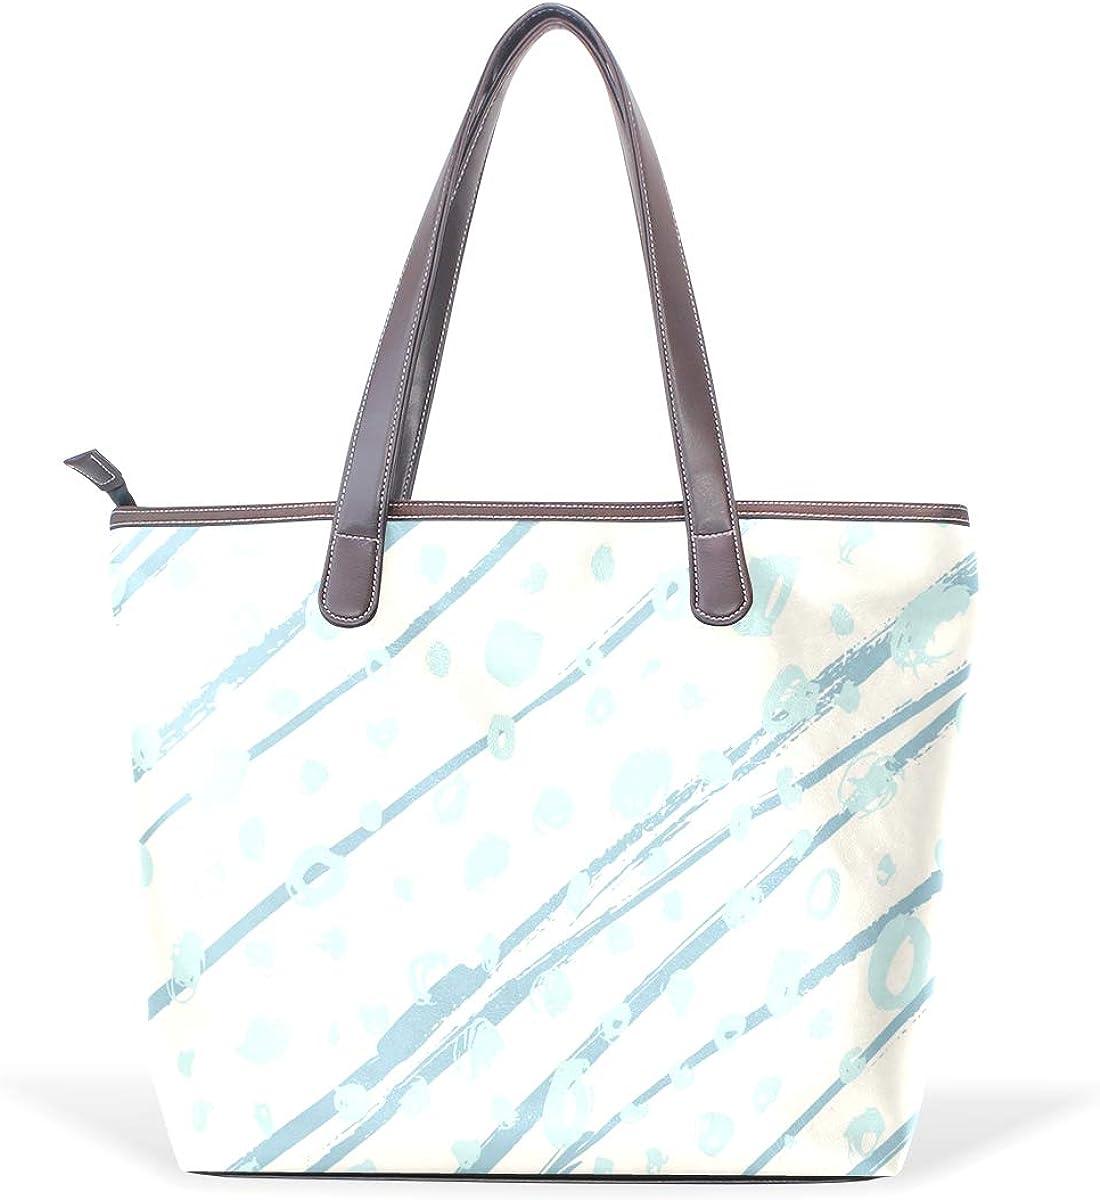 Blue And White Marble Pattern Womens Leather Handbag Shoulder Bag Satchel Handbags Leather Tote Purse Women Handle Handbags